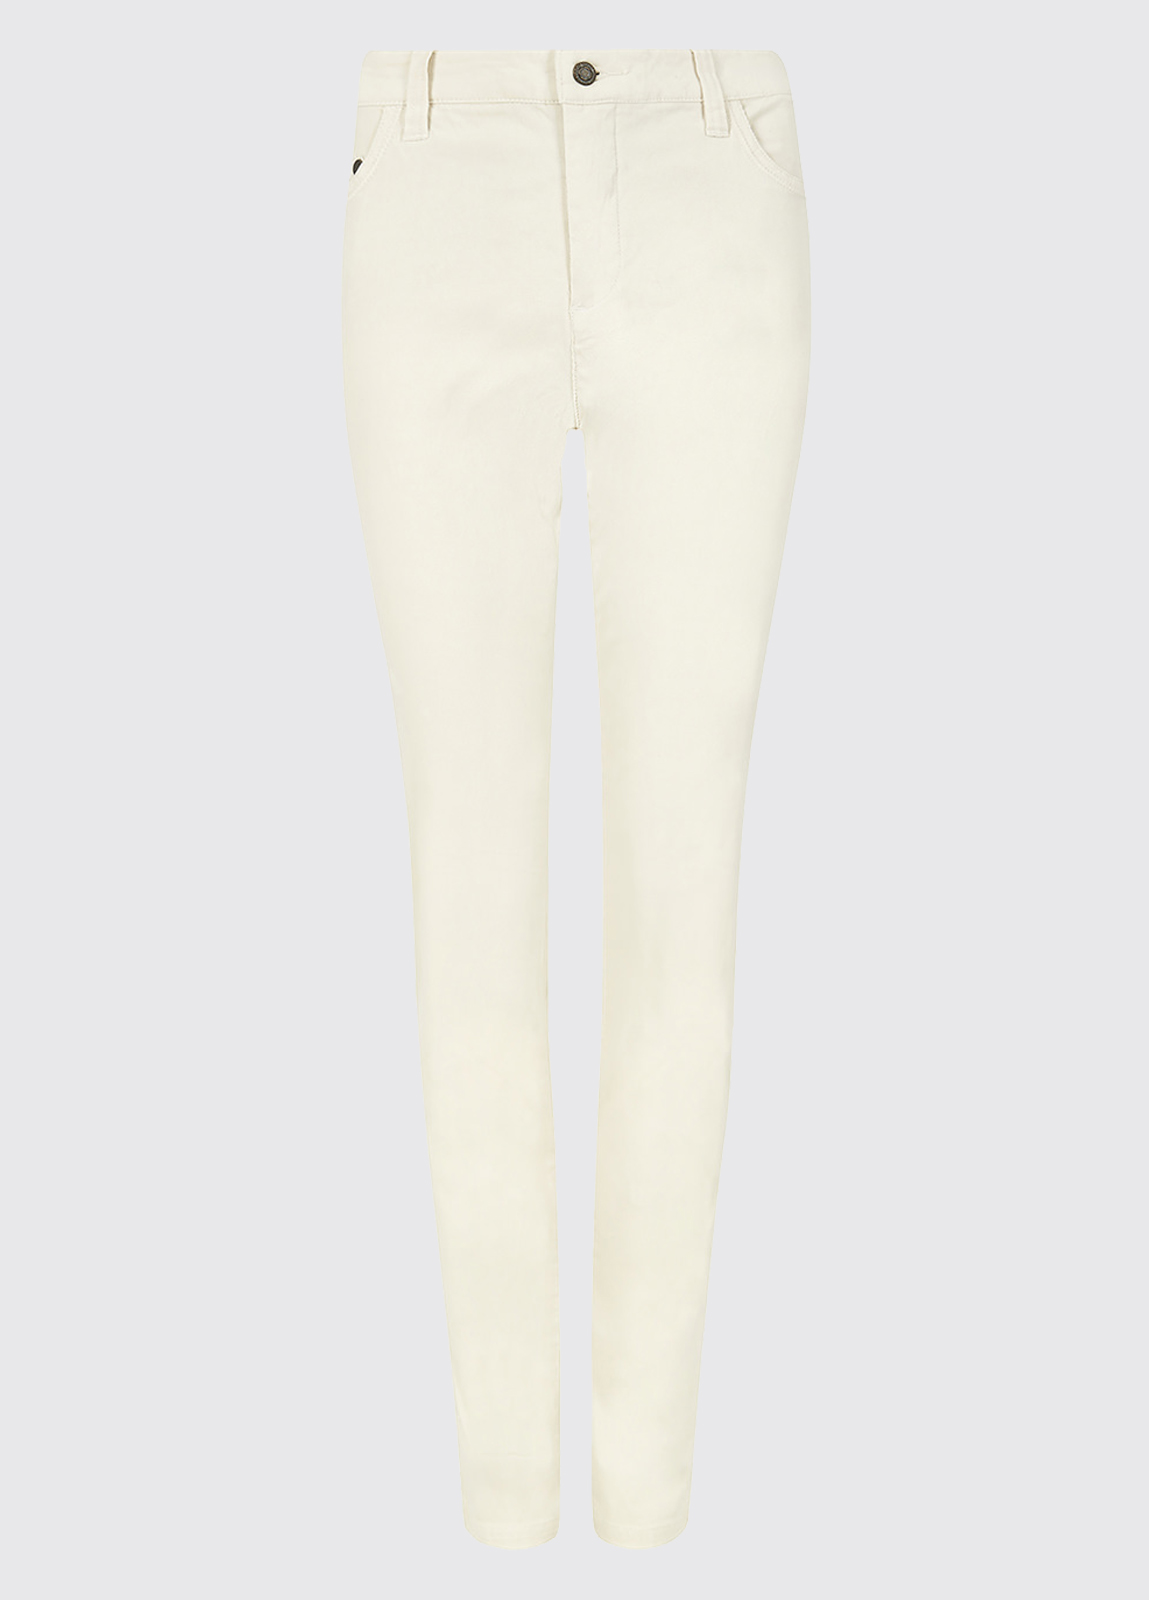 Honeysuckle Jeans - Sail White